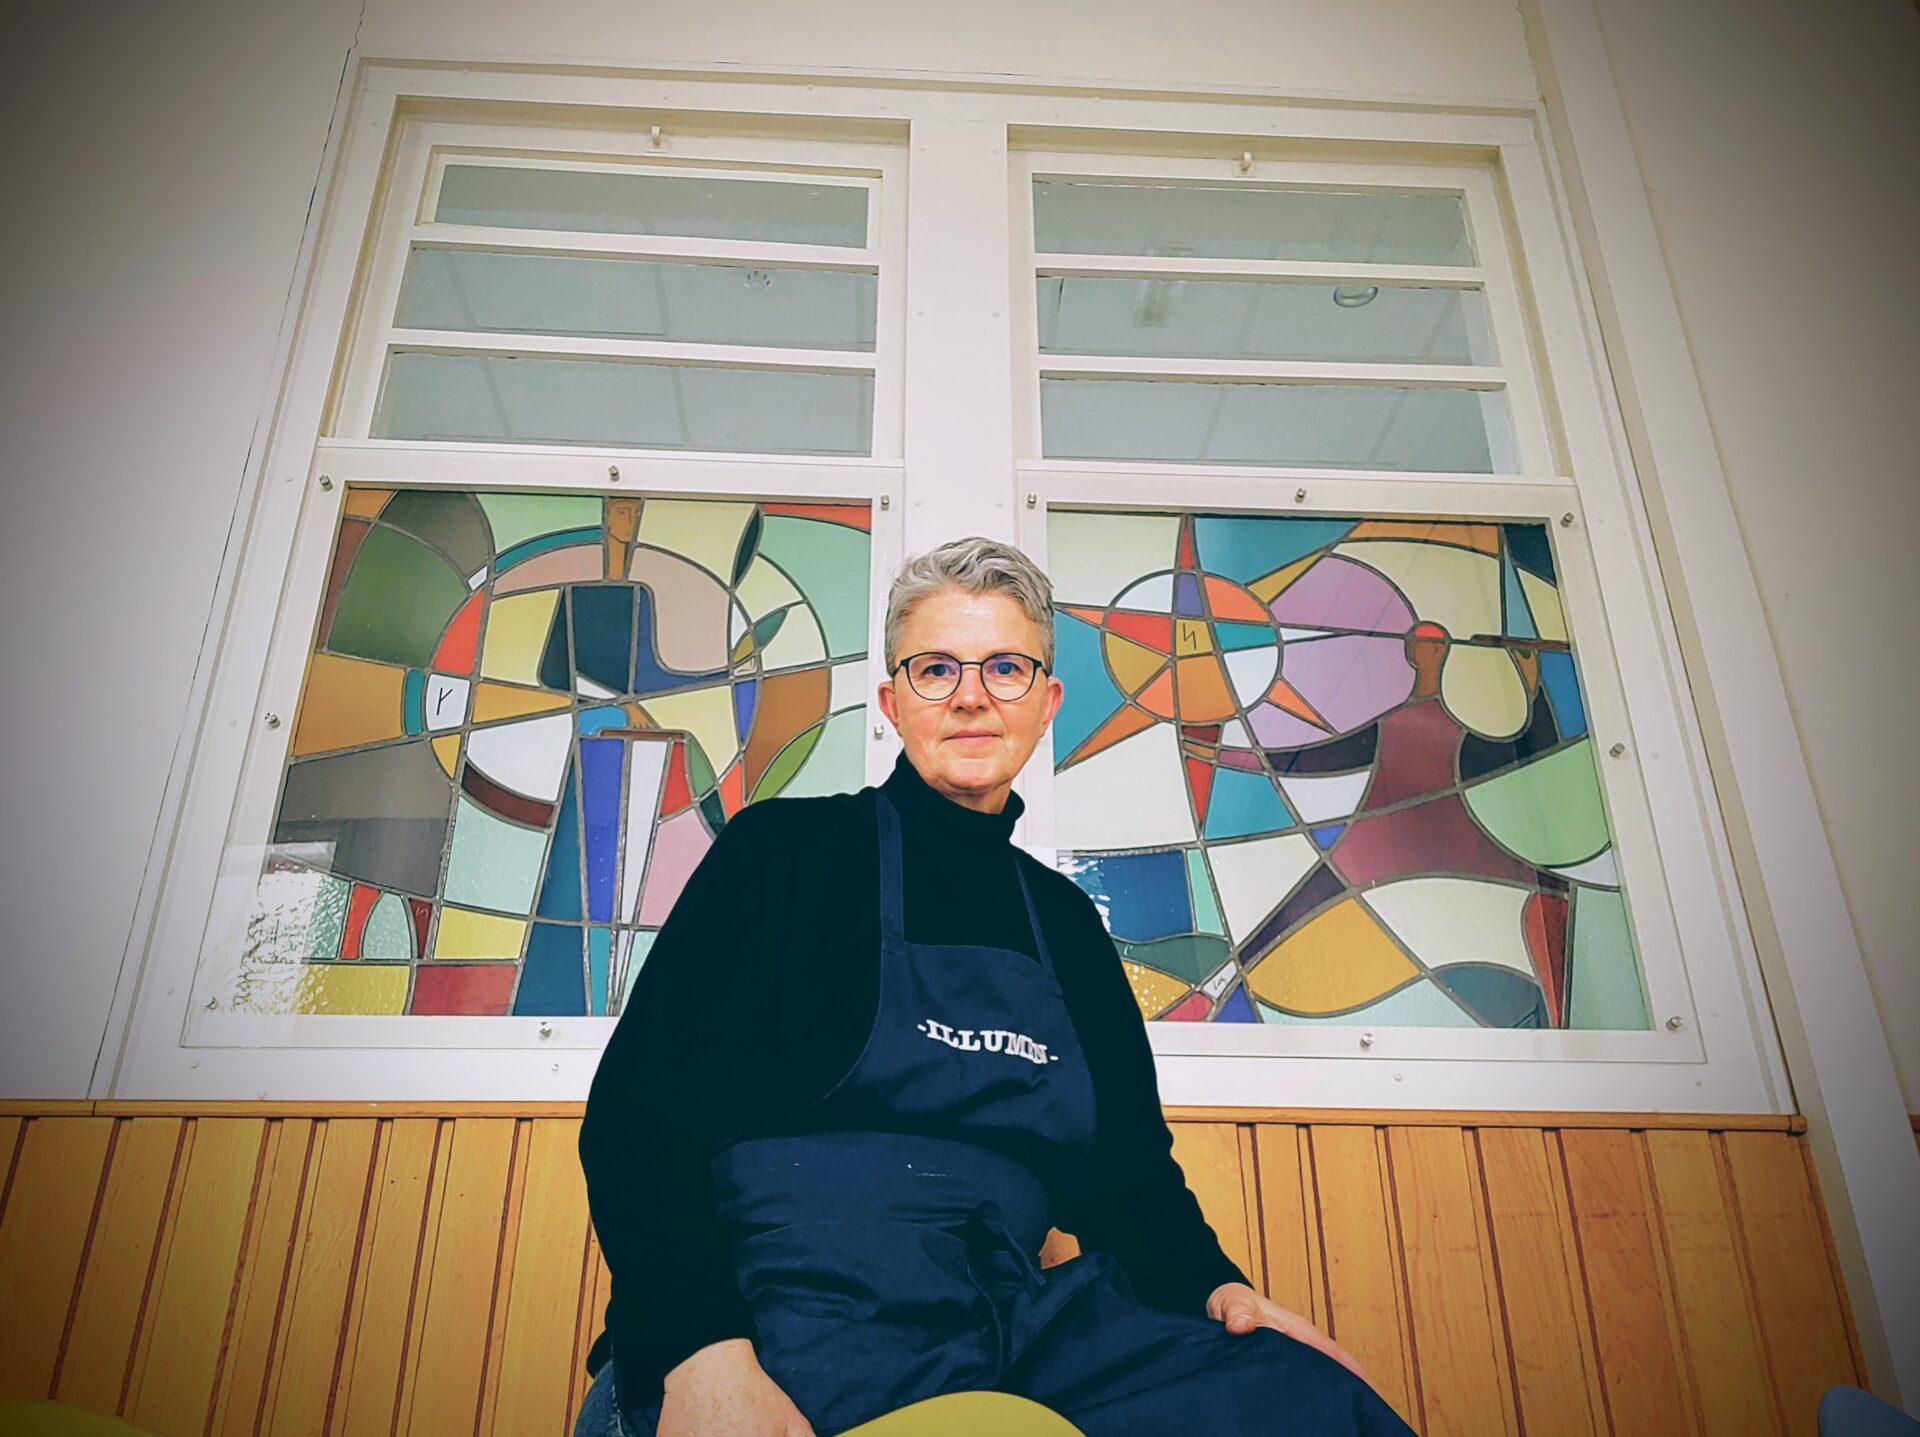 Isabelle Decallonne Atelier Illumen Glasraamdesigner